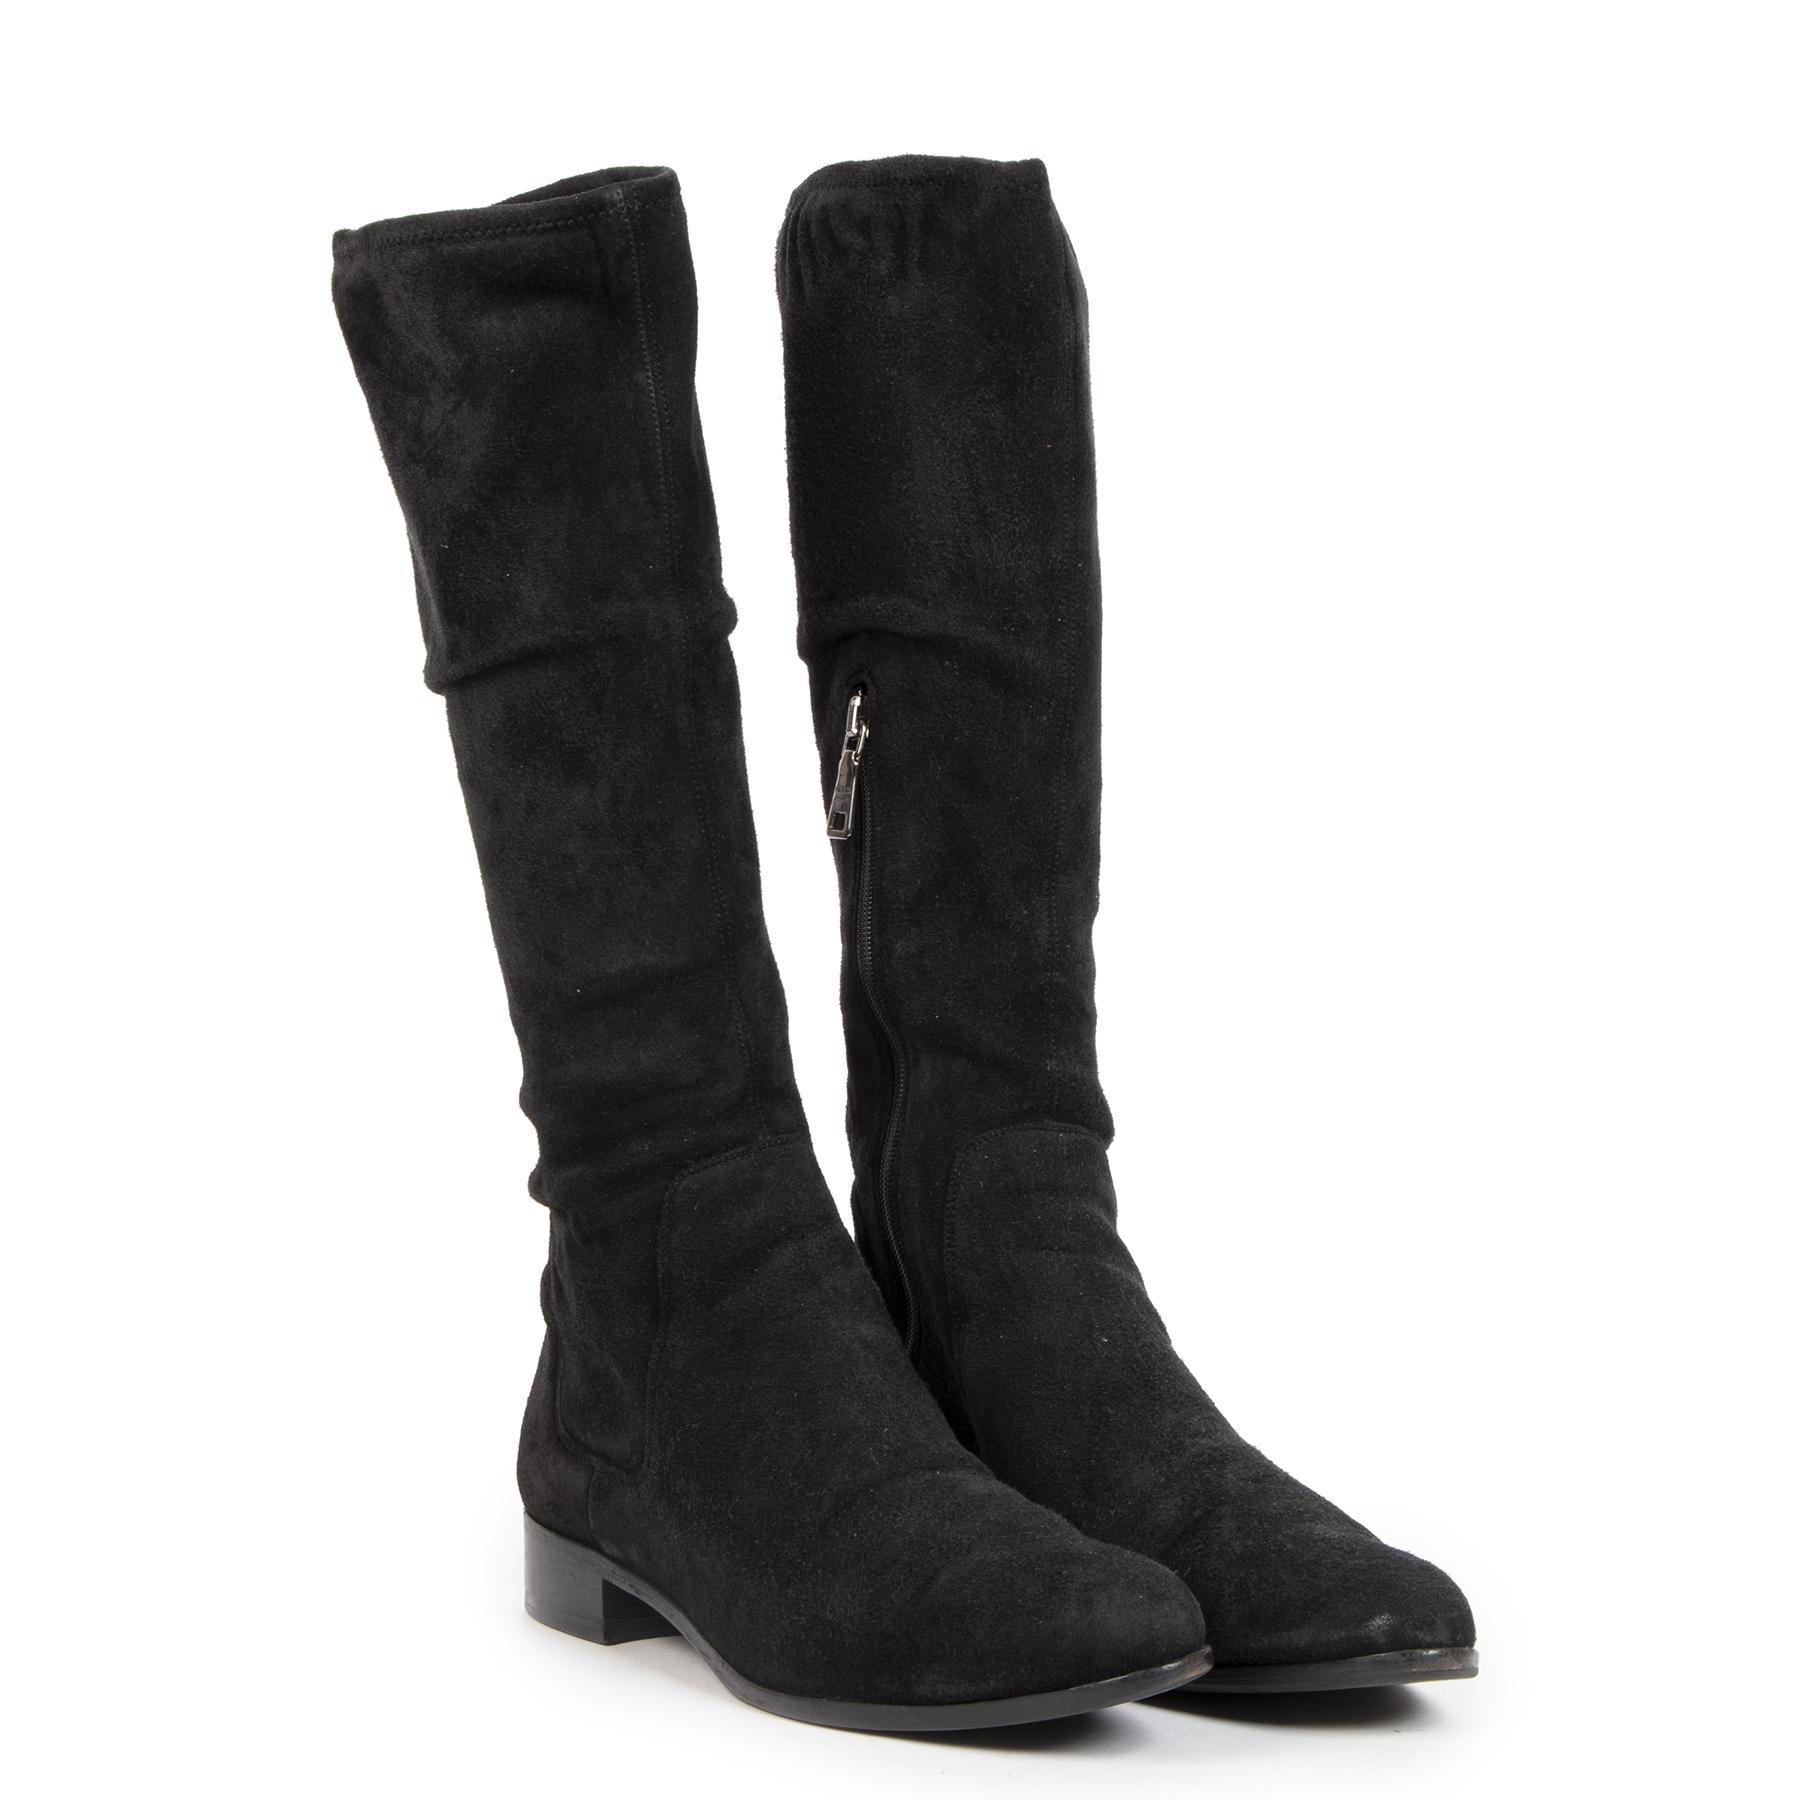 Prada Black Suede Boots - Size 38